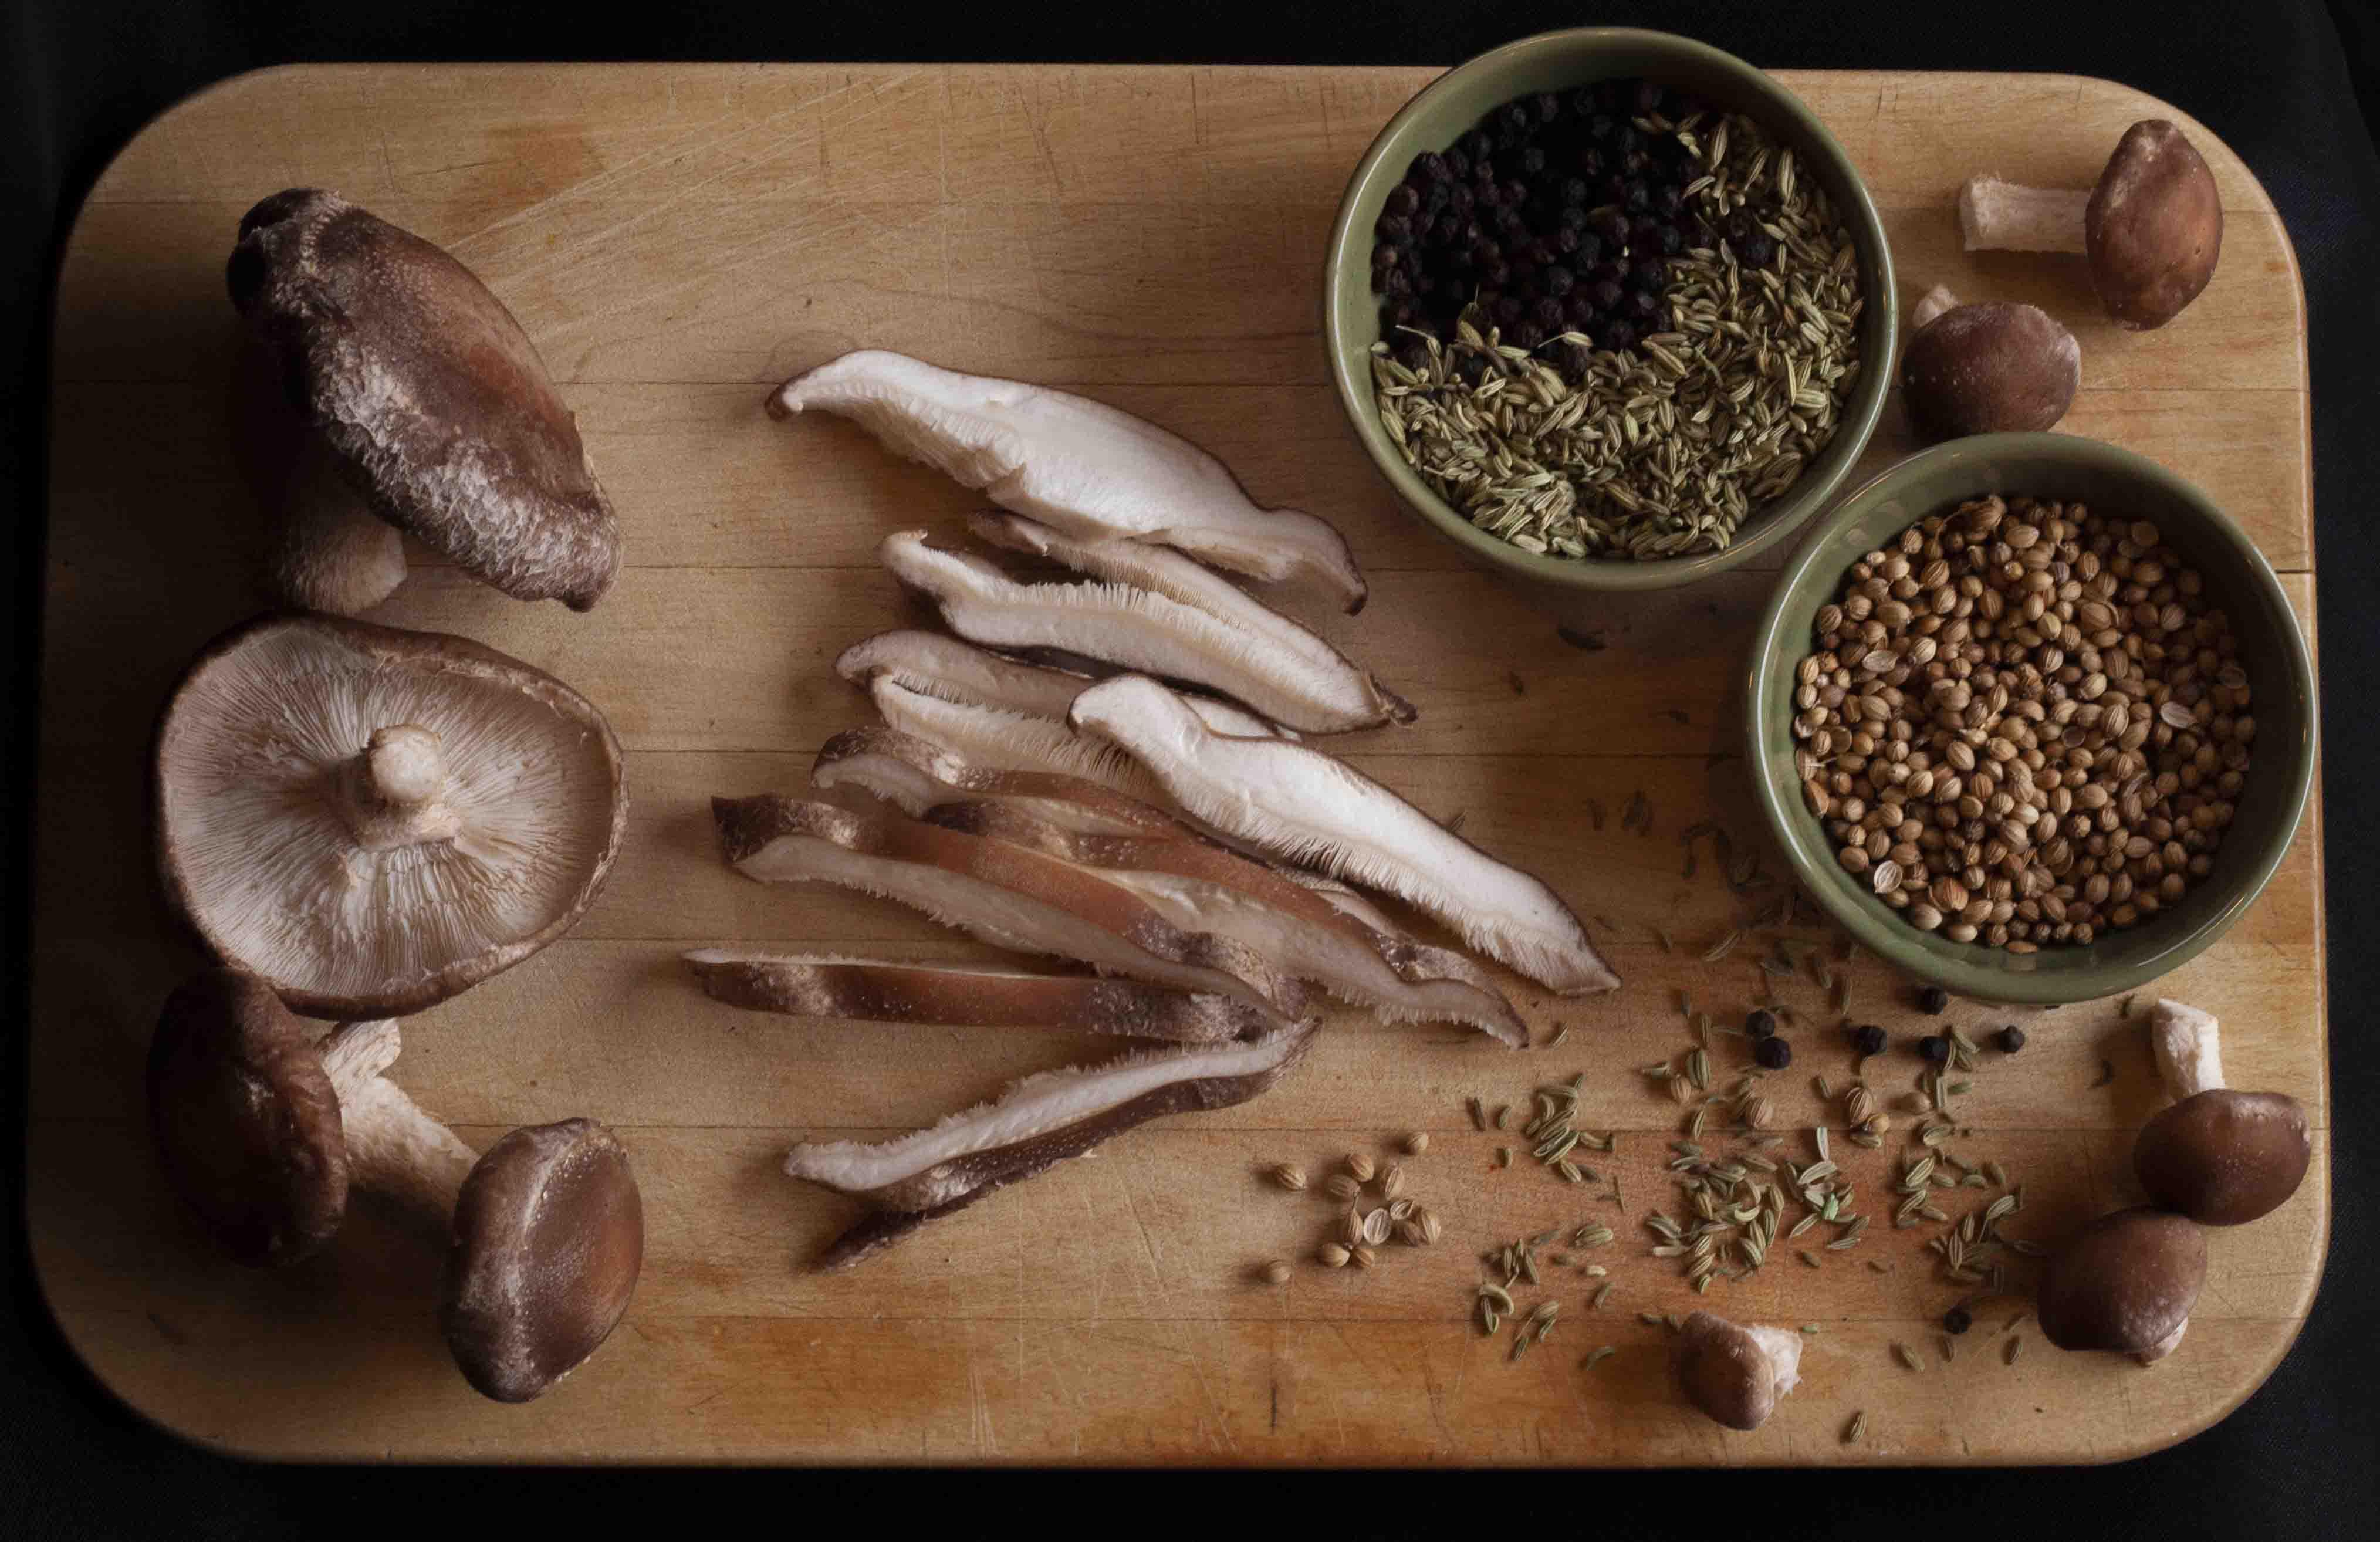 how to prepare top hat shiitake mushrooms organic shiitake mushrooms how to prepare recipes cooking shiitake dinner